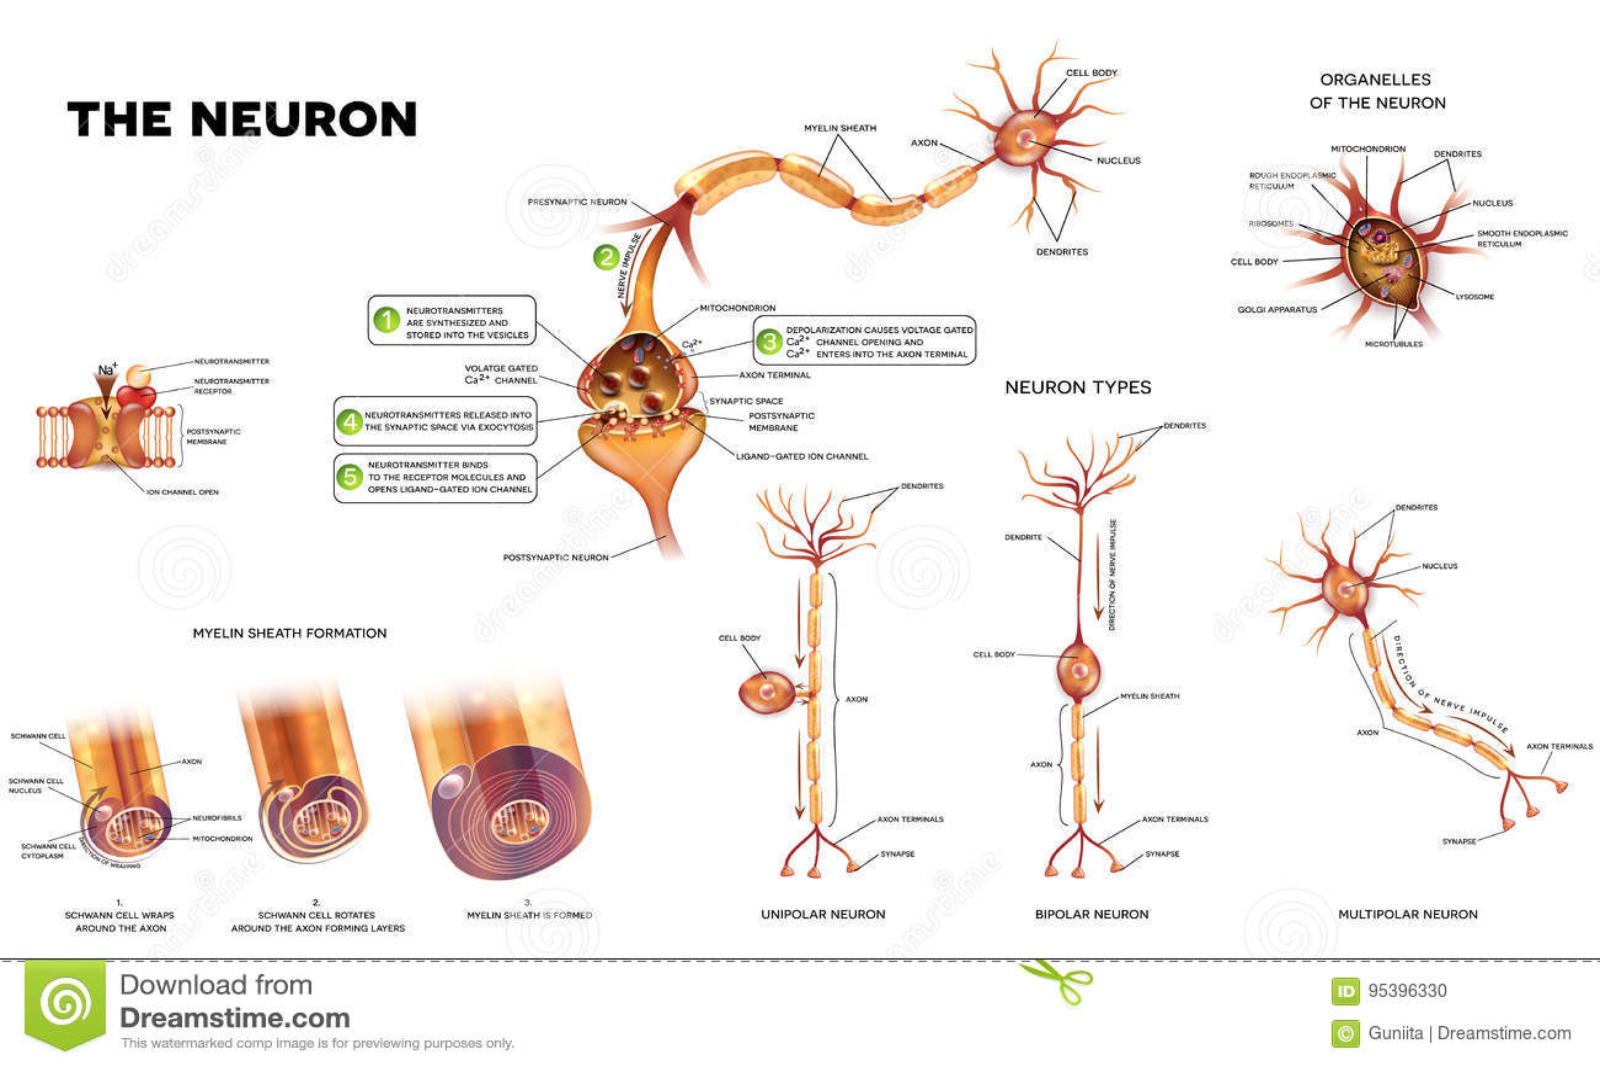 The neuron anatomy poster stock vector. Illustration of myelination ...